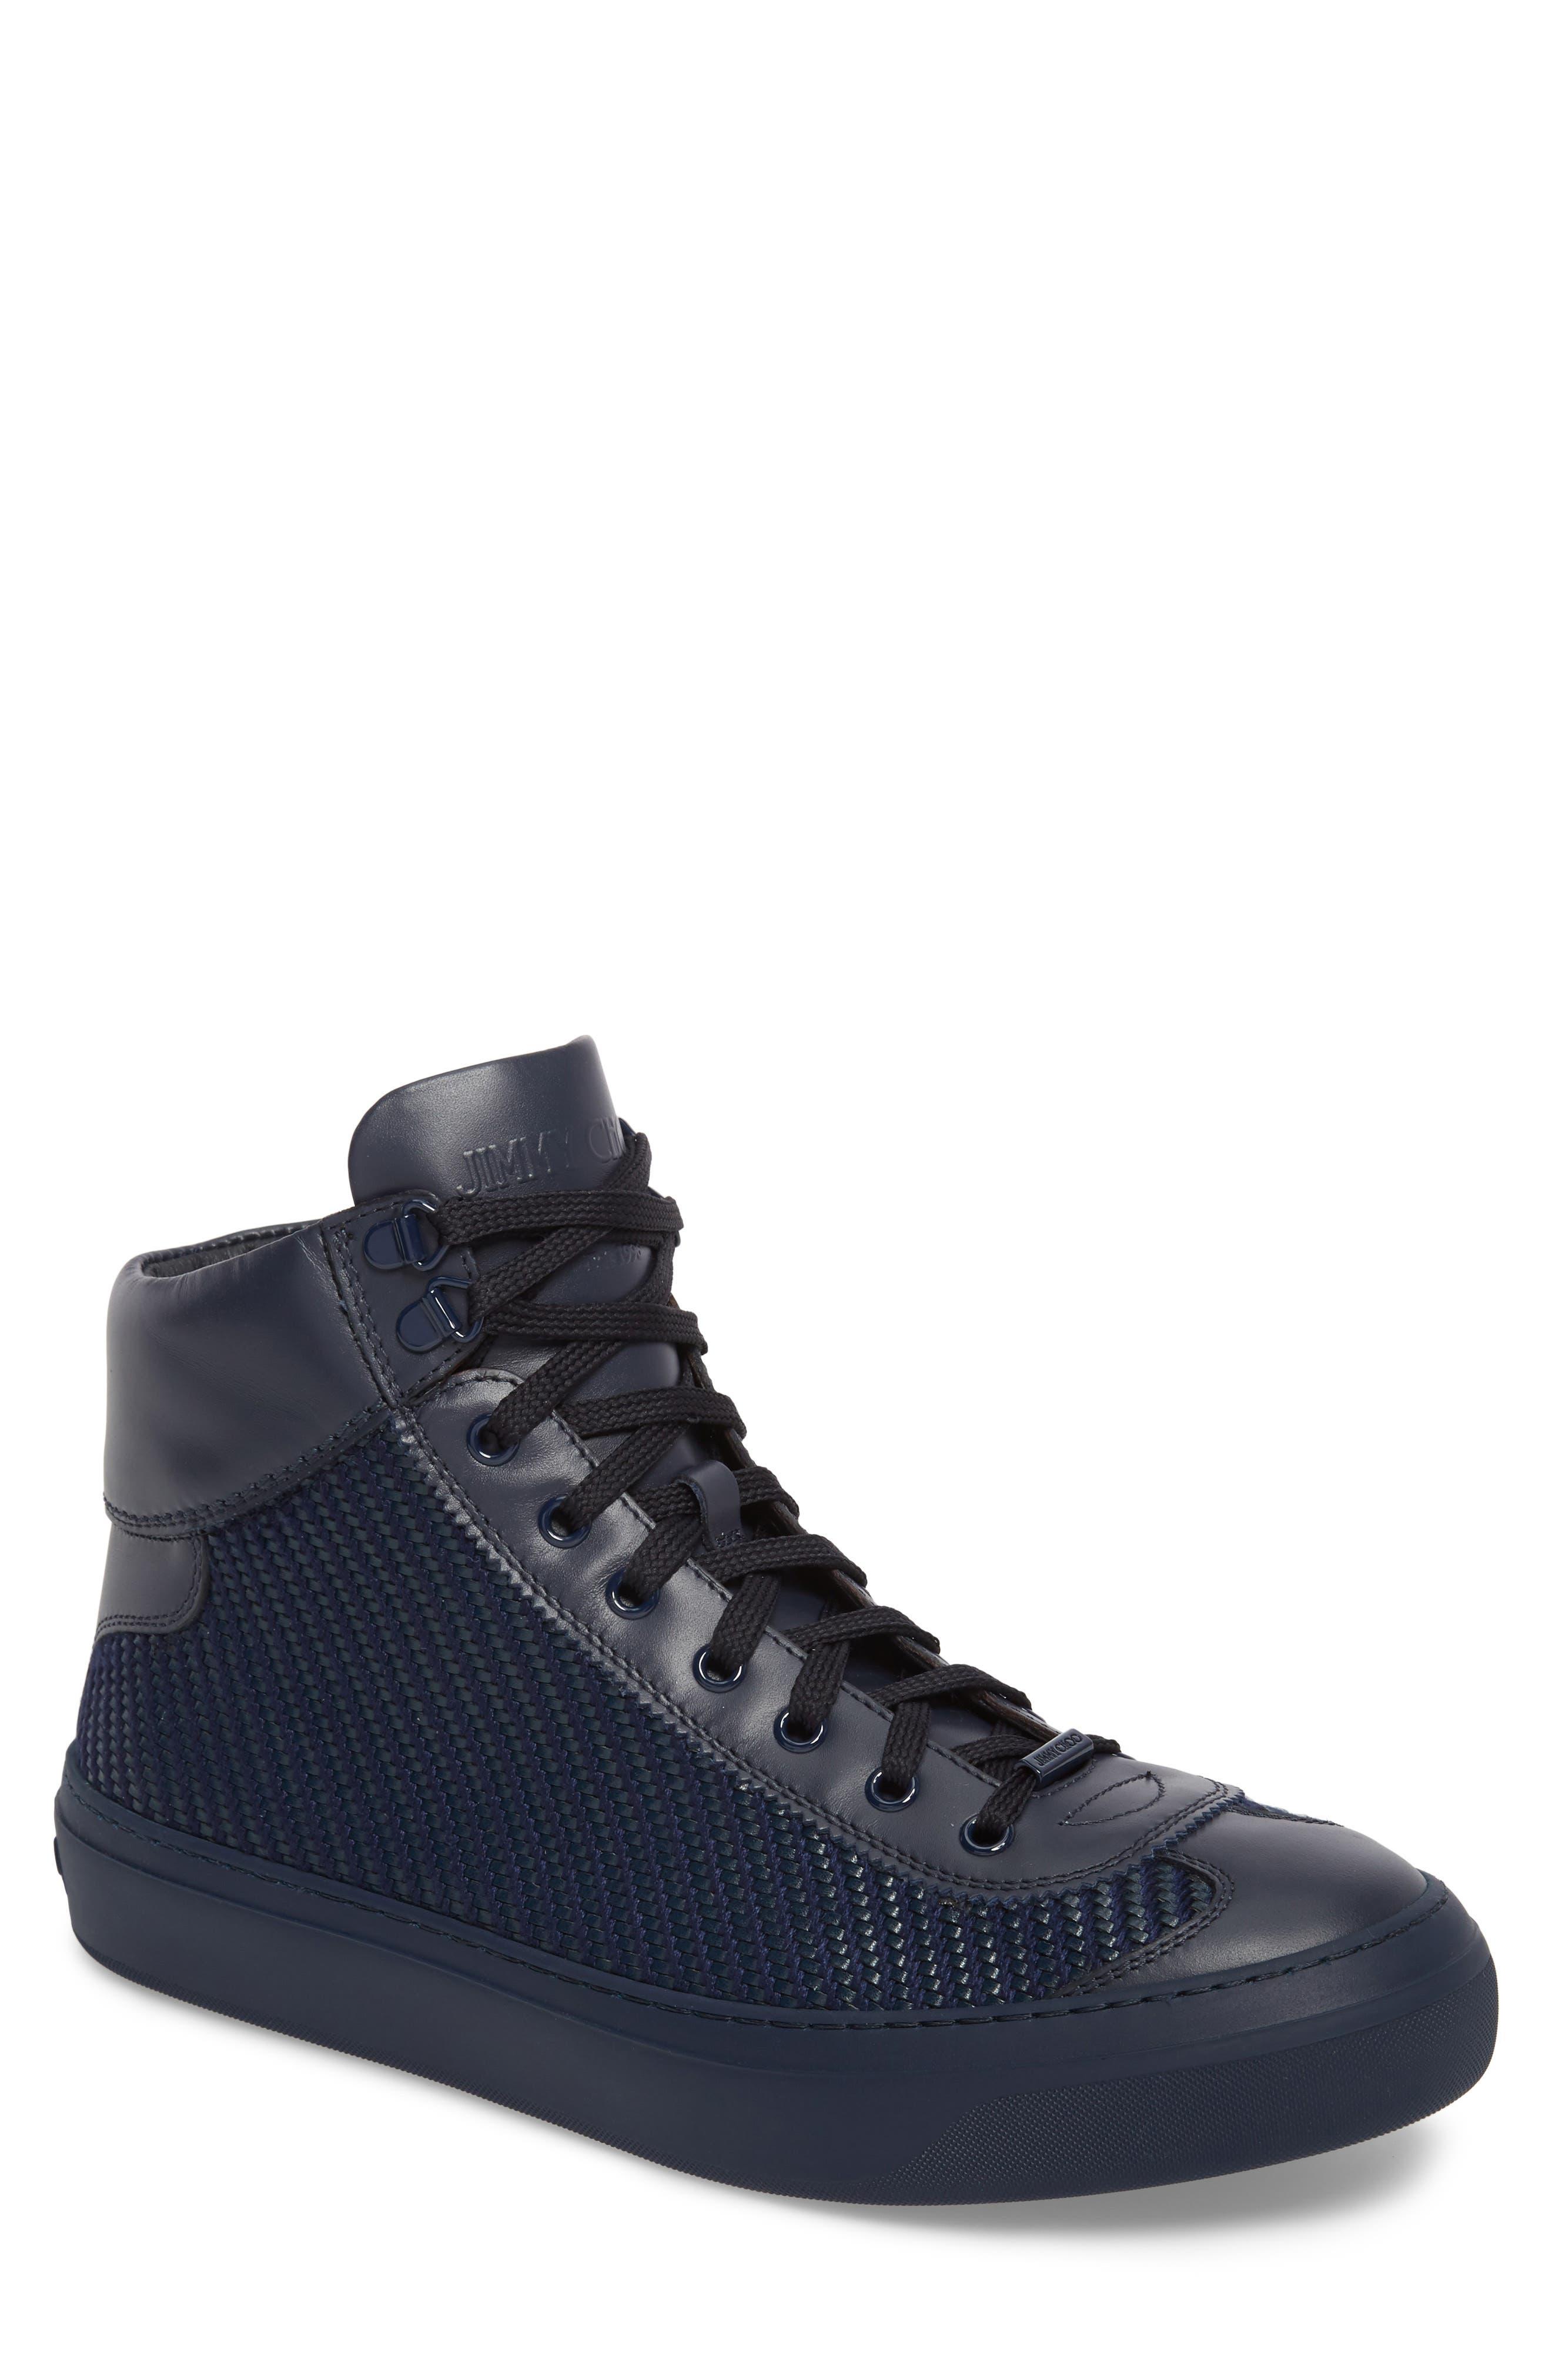 Argyle Sneaker,                             Main thumbnail 1, color,                             Navy